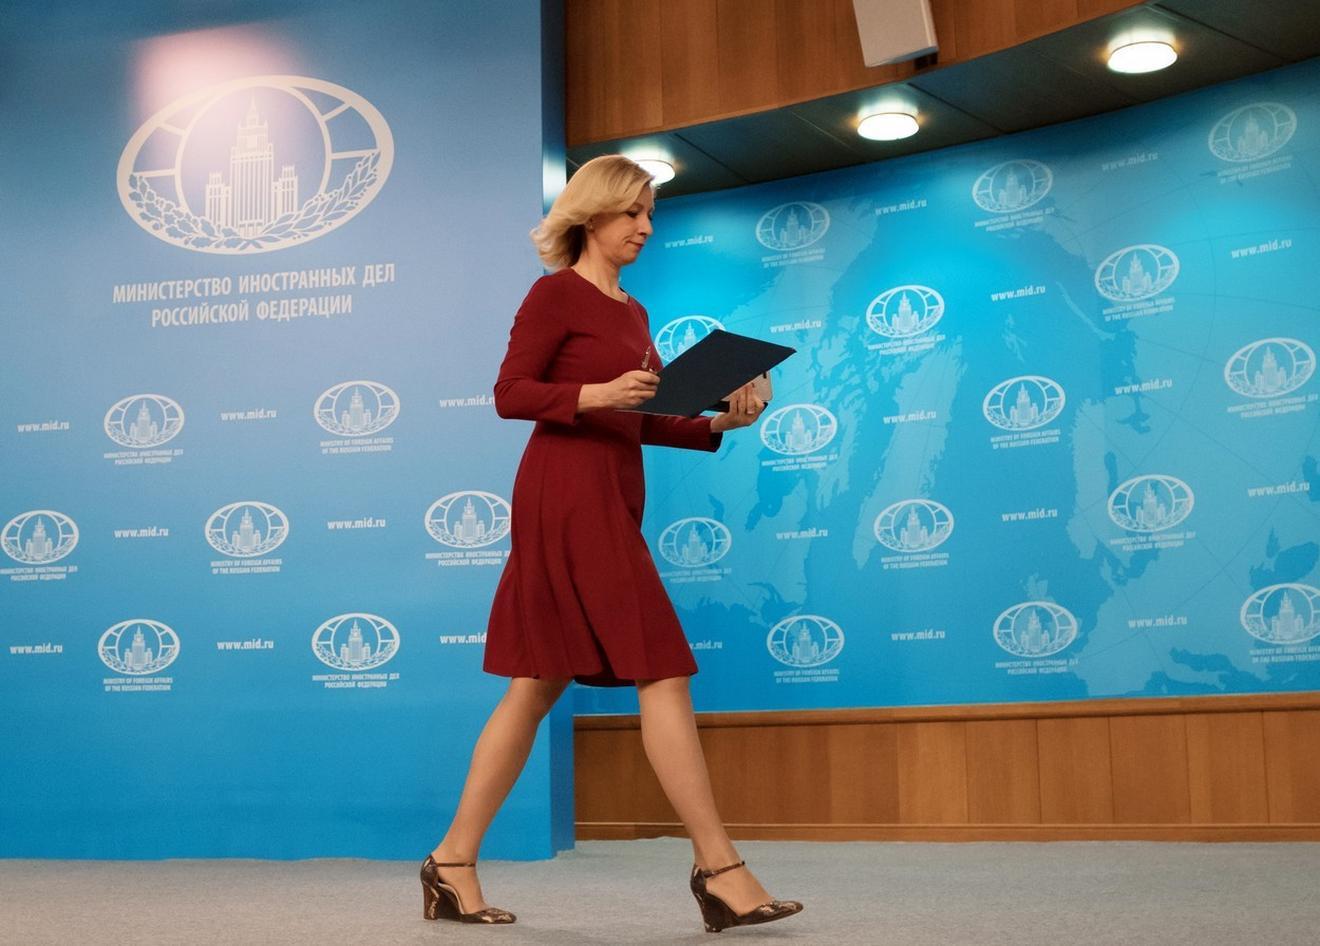 Priredila je nedavno na konferenciji u Moskvi modno iznenađenje